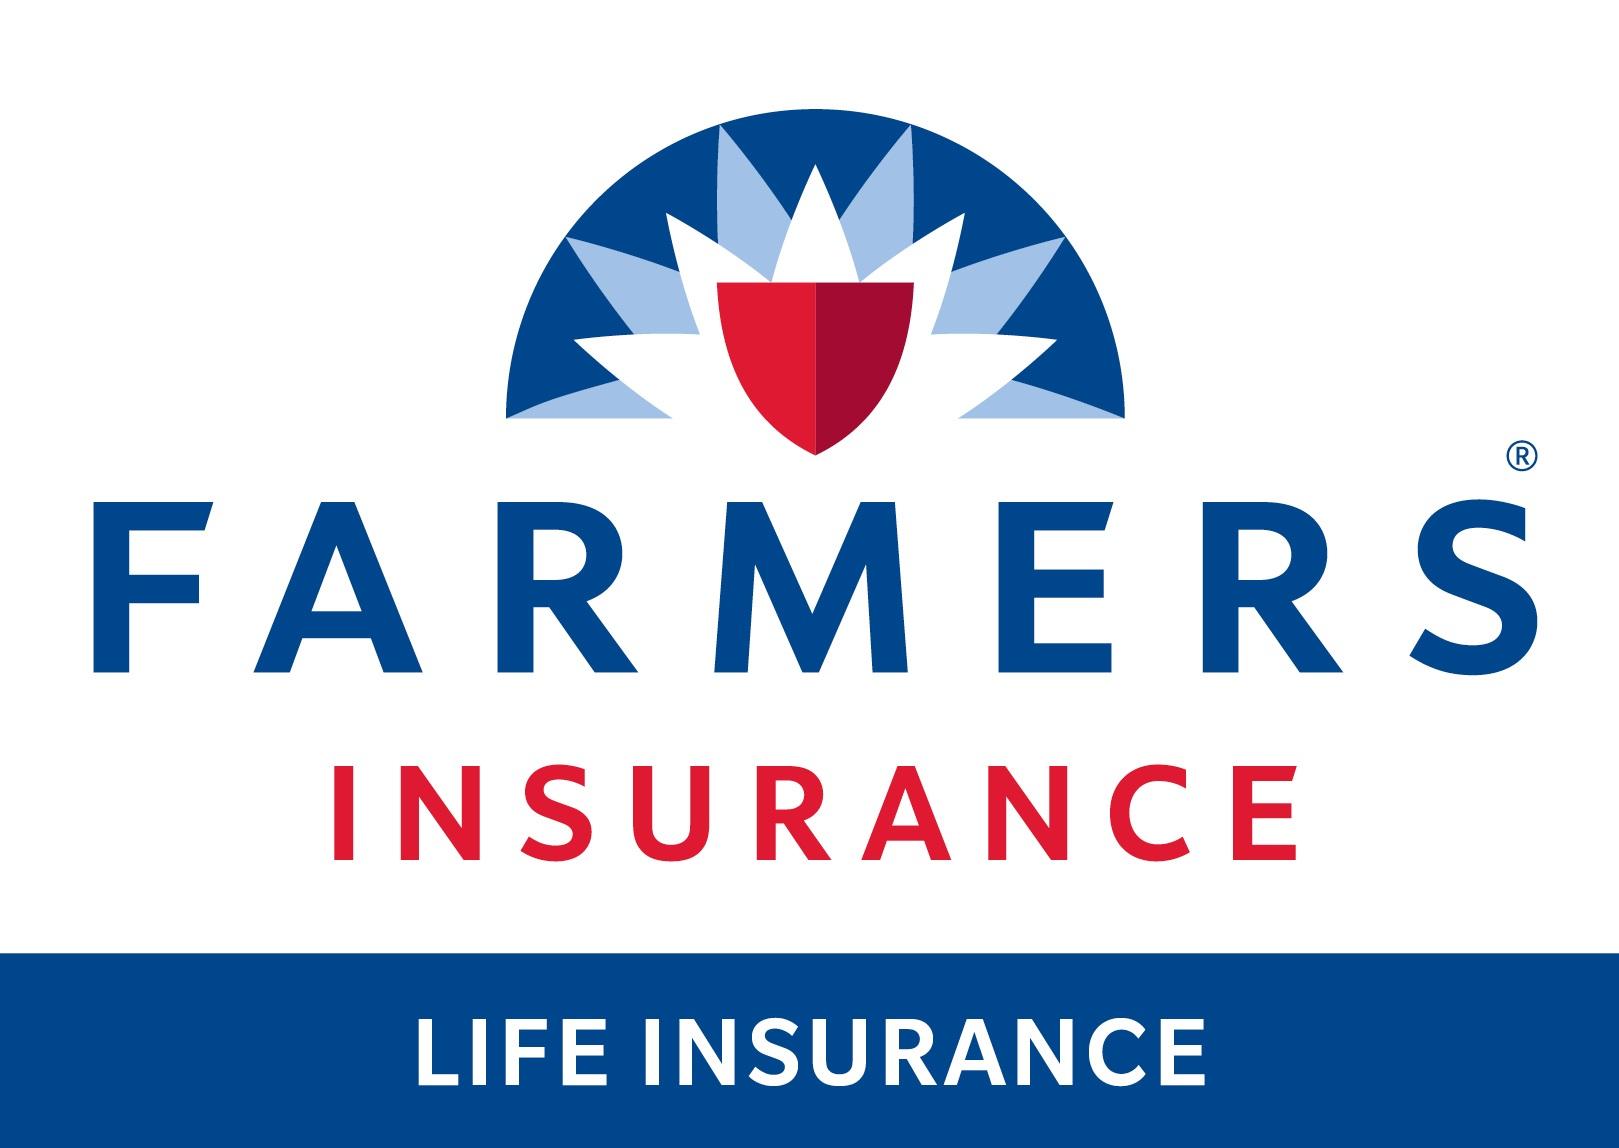 Farmer Life Insurance